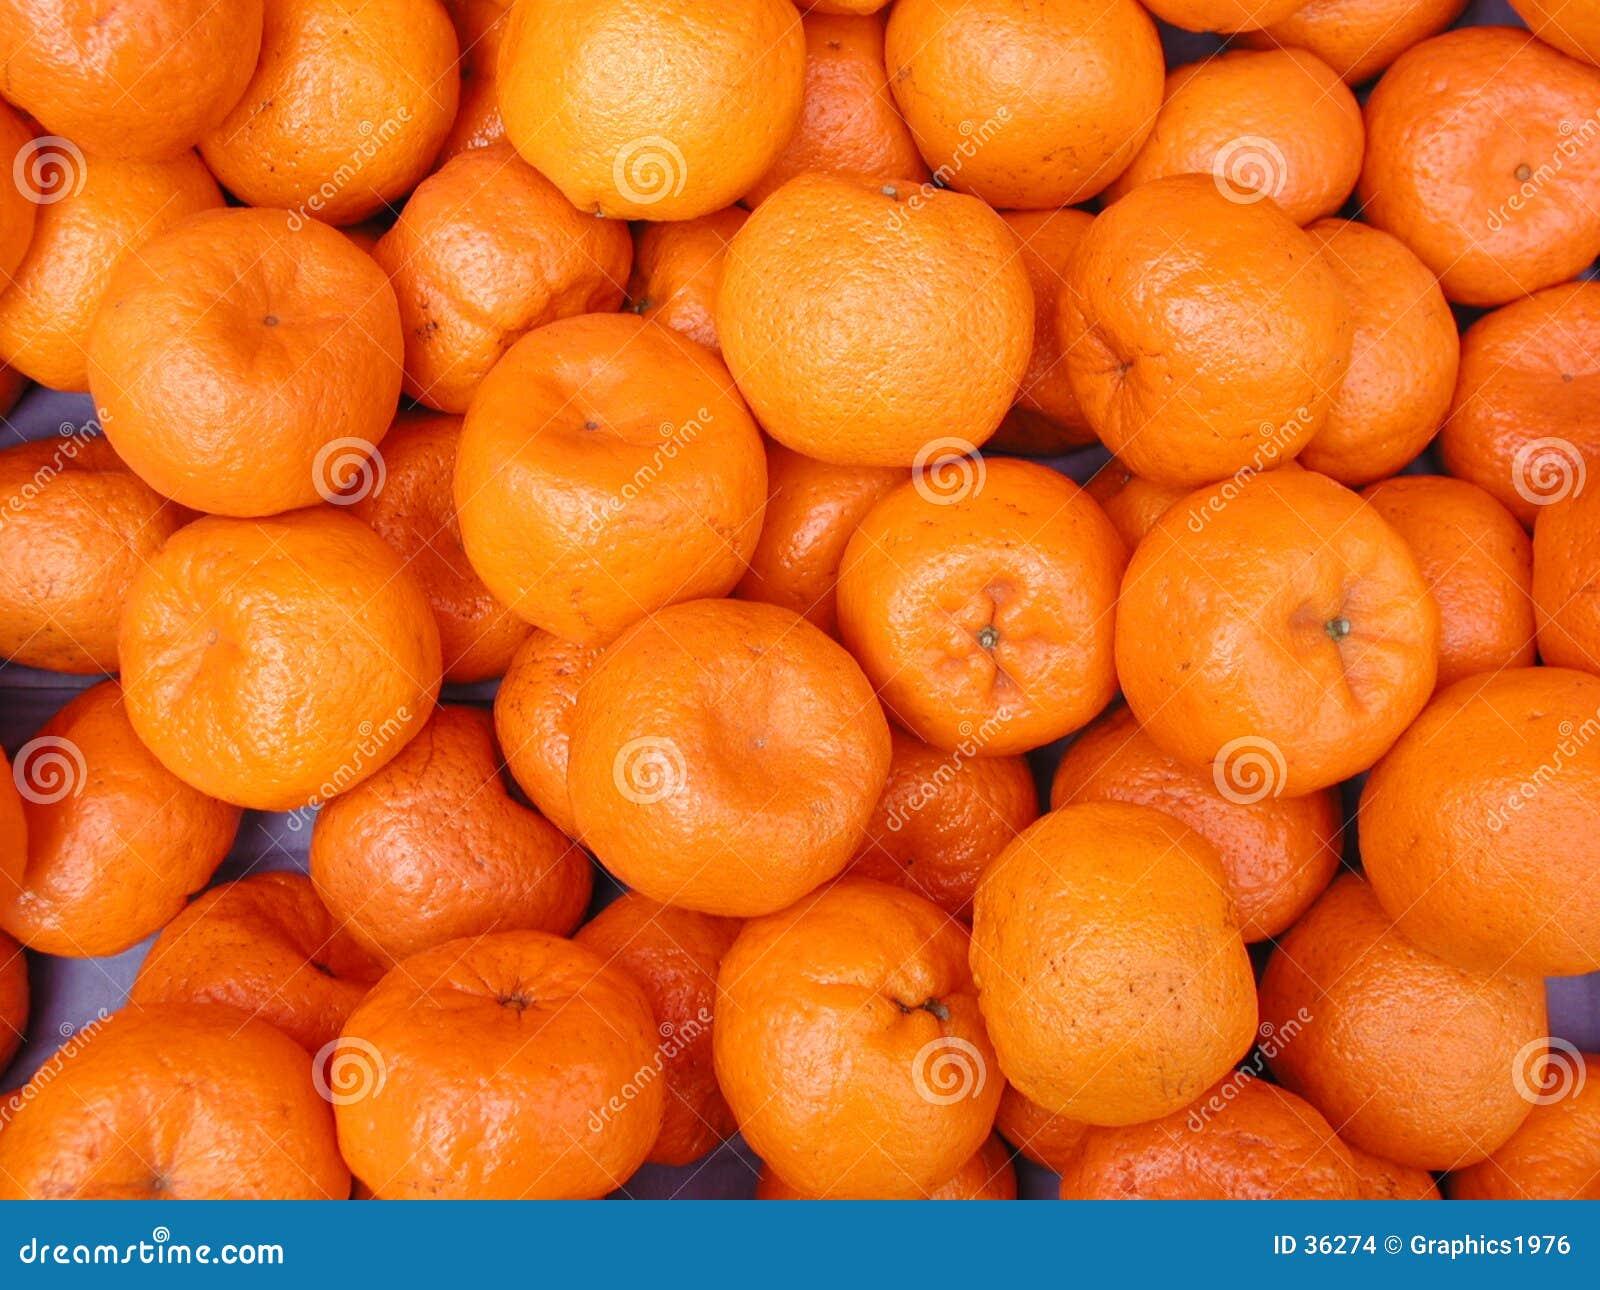 Mandarins - fruit background